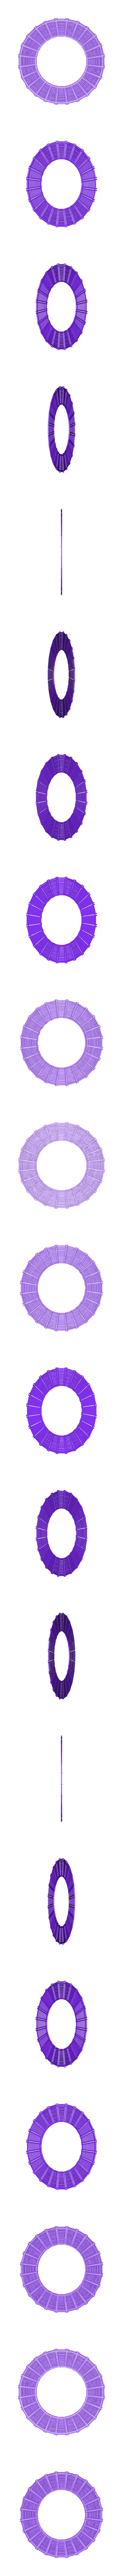 360_plat1.stl Download free STL file The Crannog • 3D printable template, Earsling